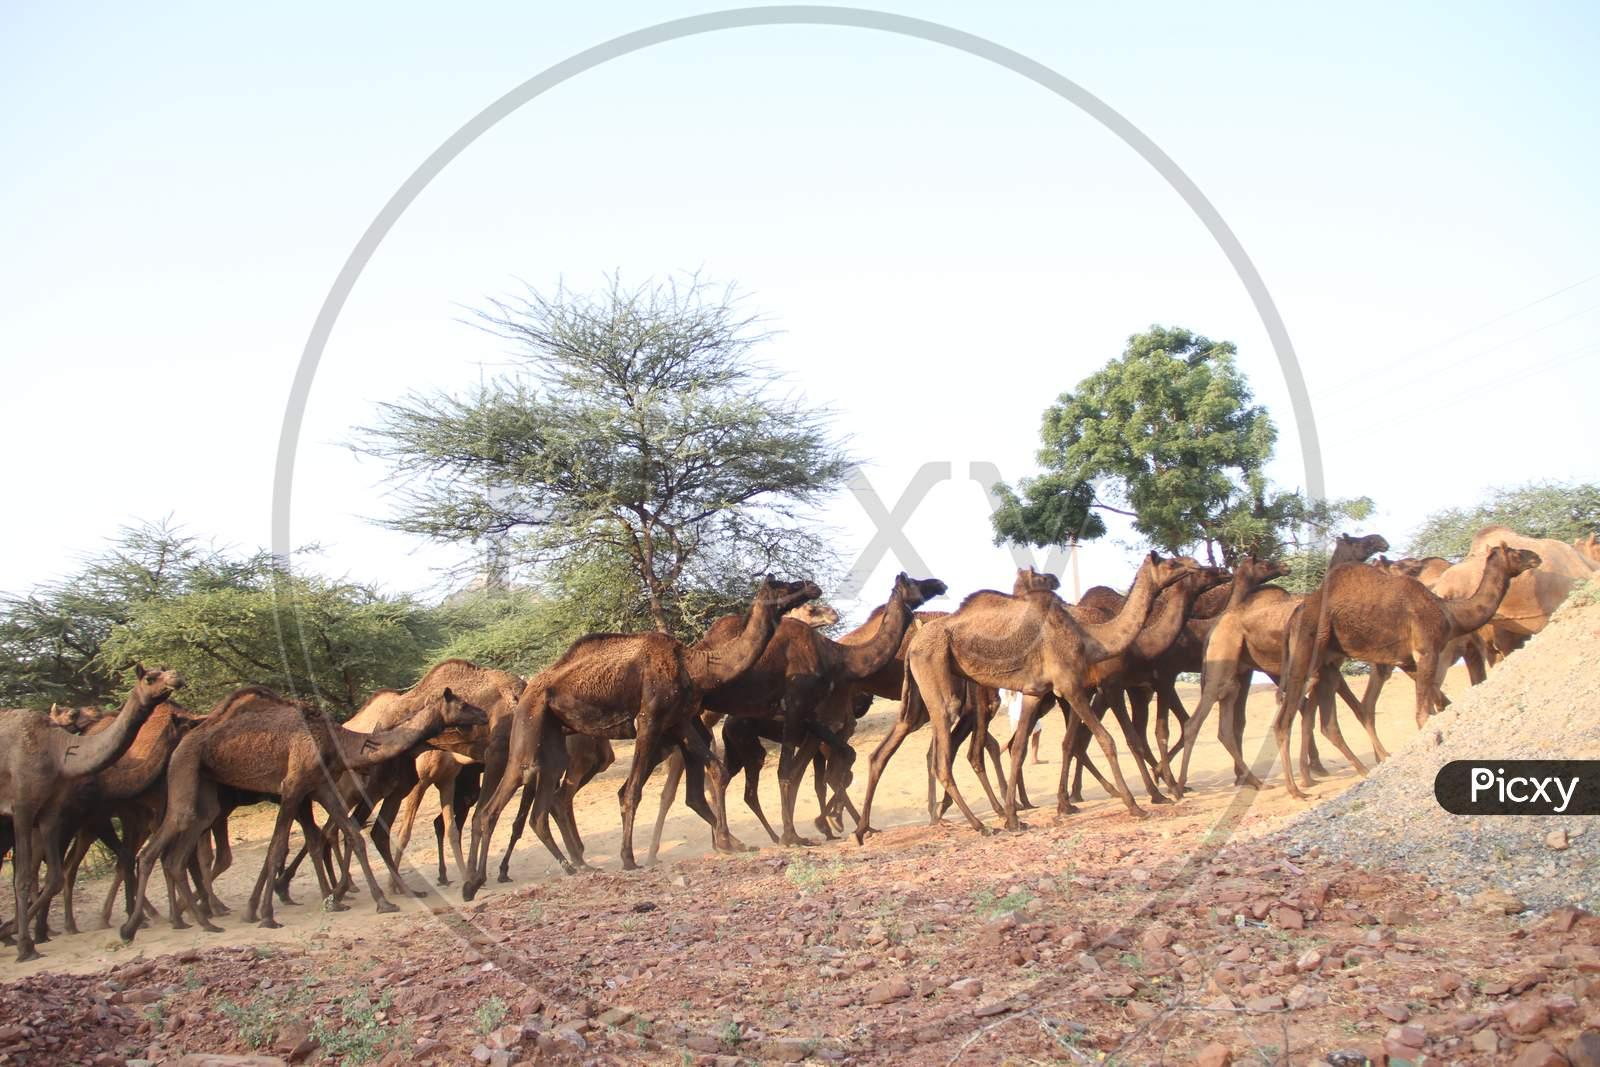 Caravan  Of Camels At Pushkar Camel Fair, Rajasthan